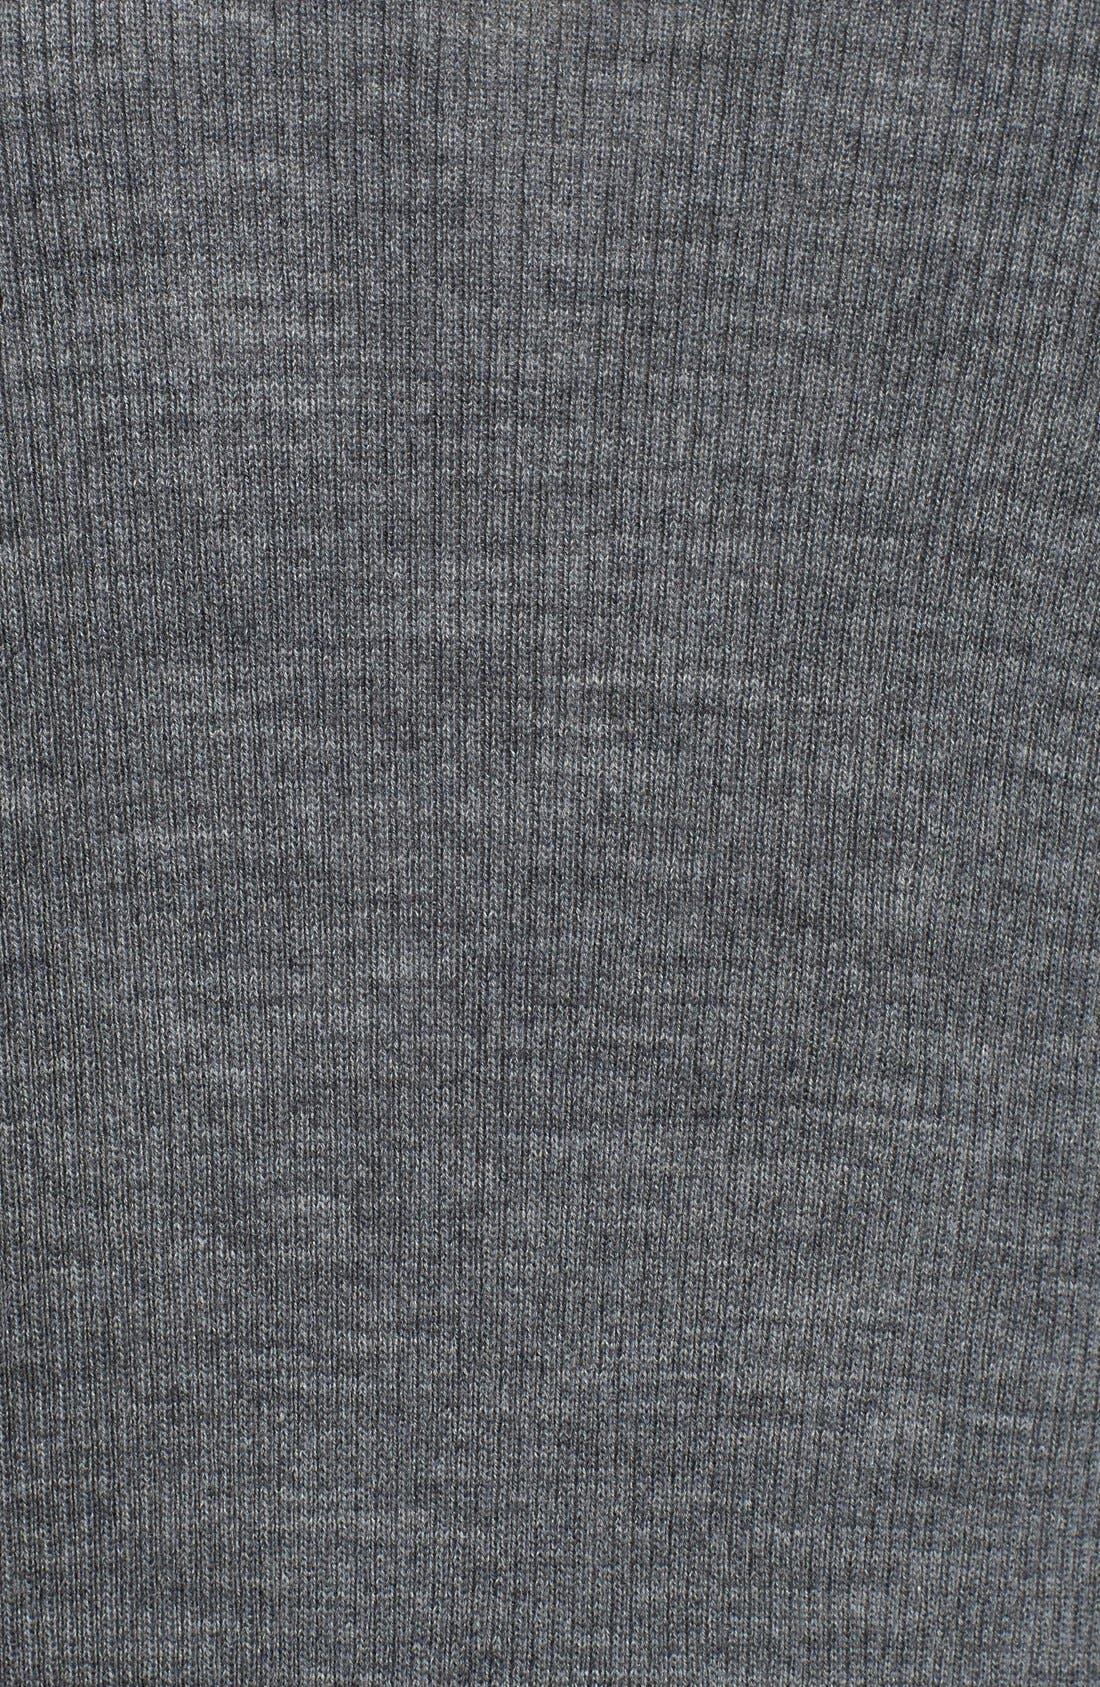 Rib Knit Wool Blend Cardigan,                             Alternate thumbnail 64, color,